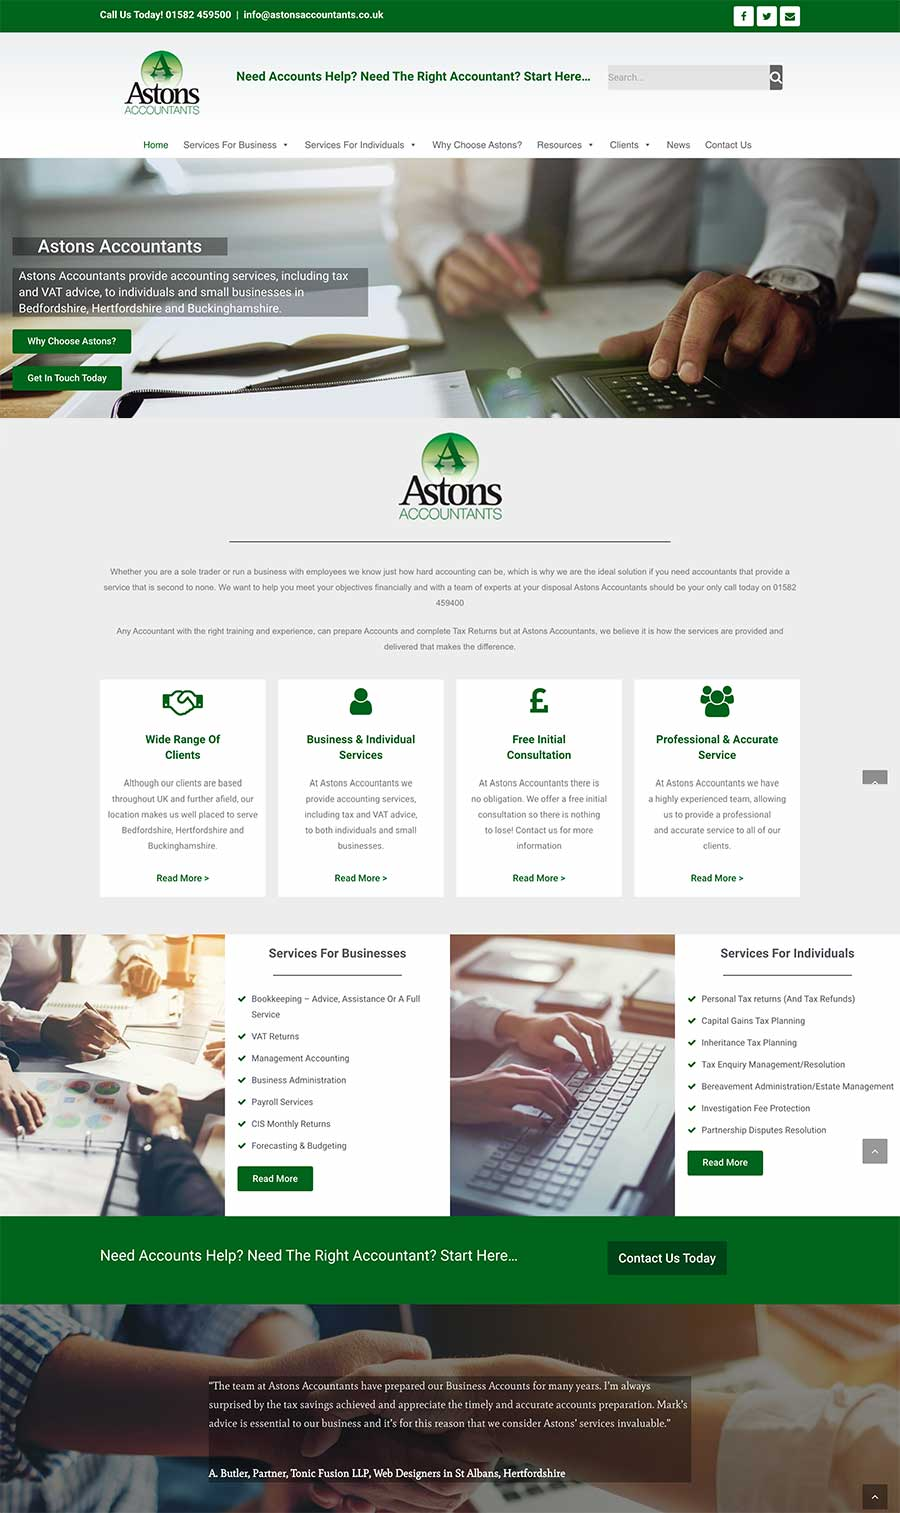 Astons Accountants